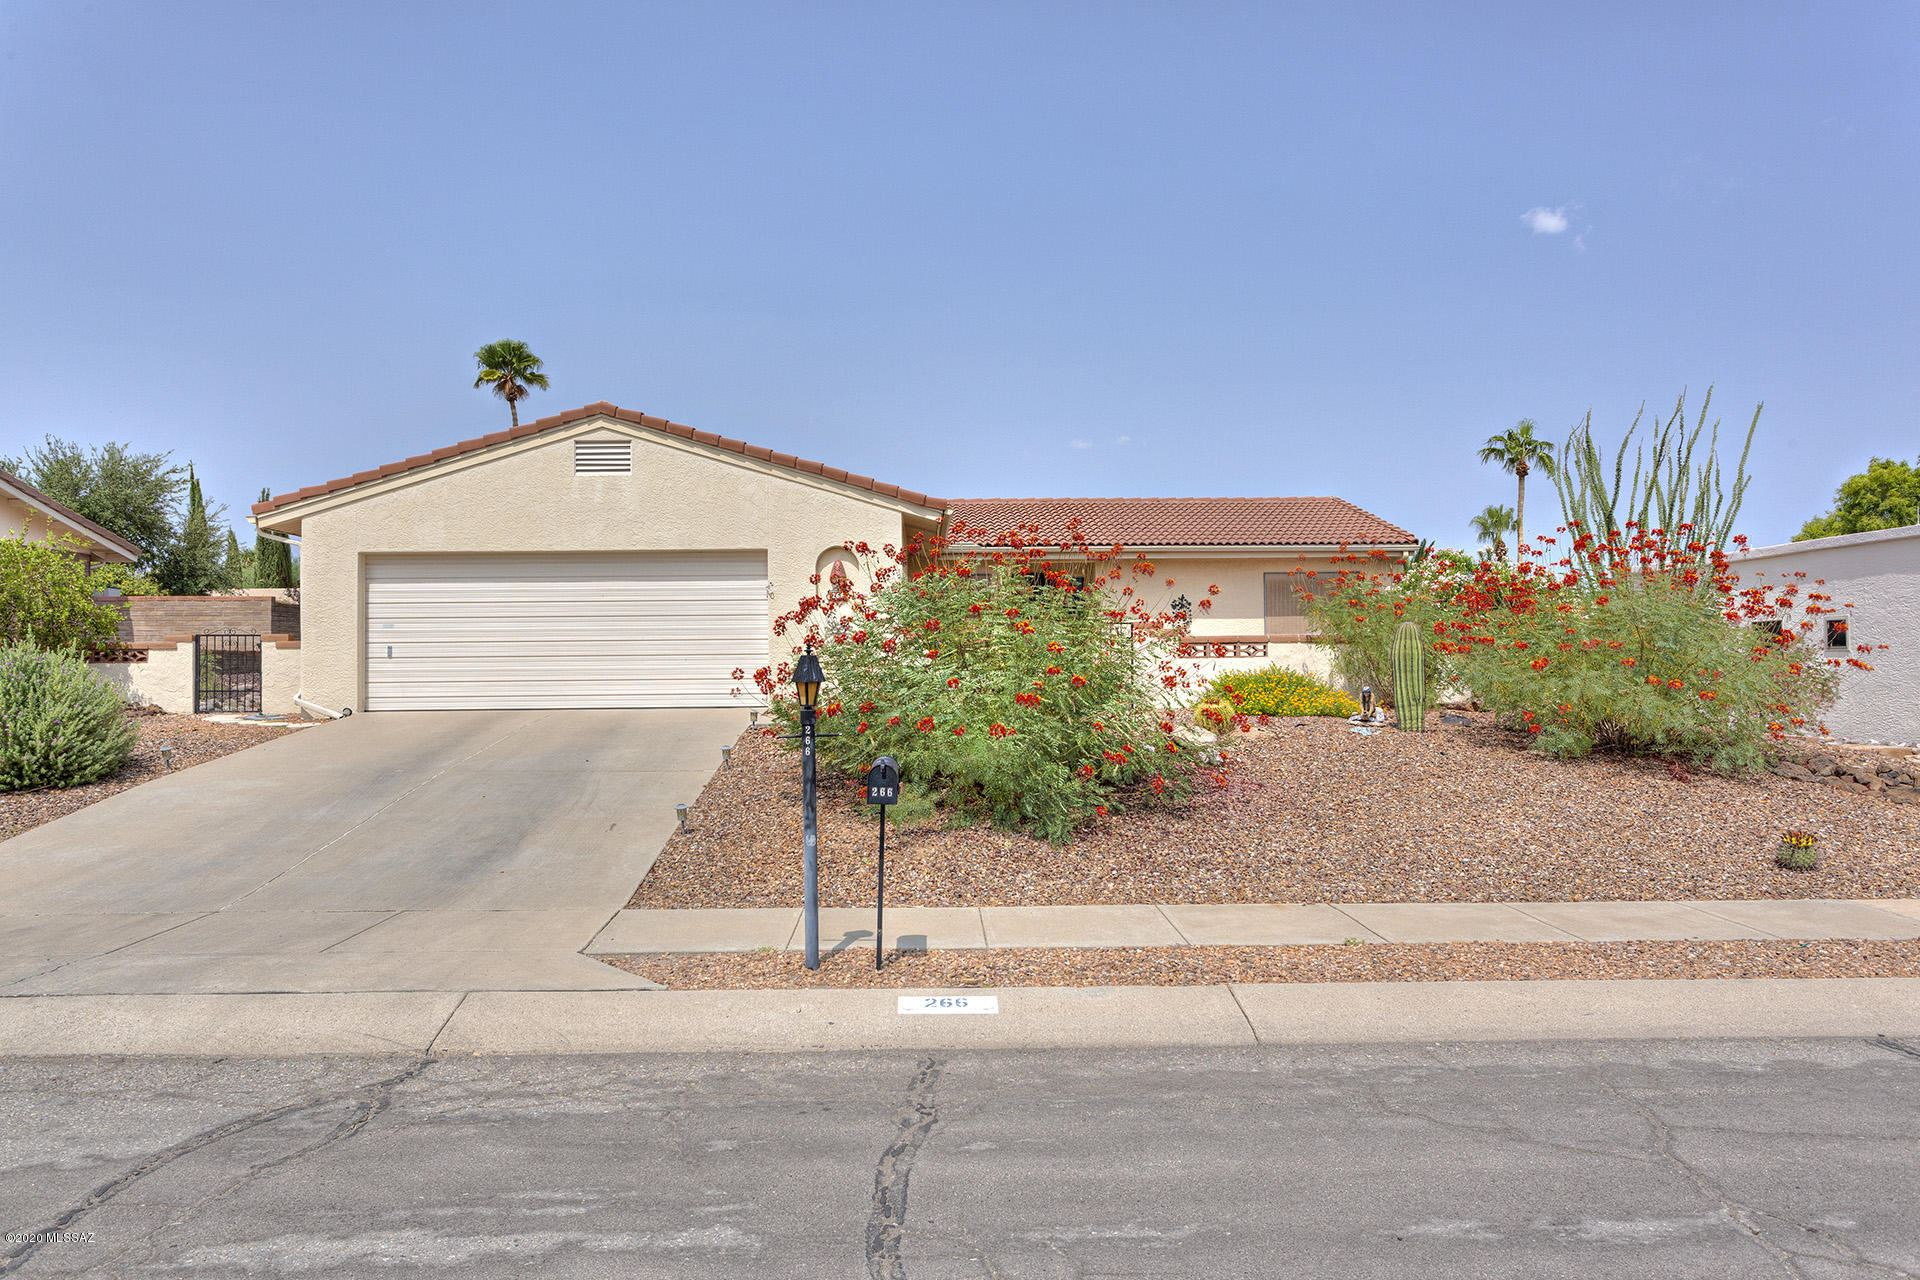 266 W Calle Frambuesa, Green Valley, AZ 85614 - MLS#: 22023033